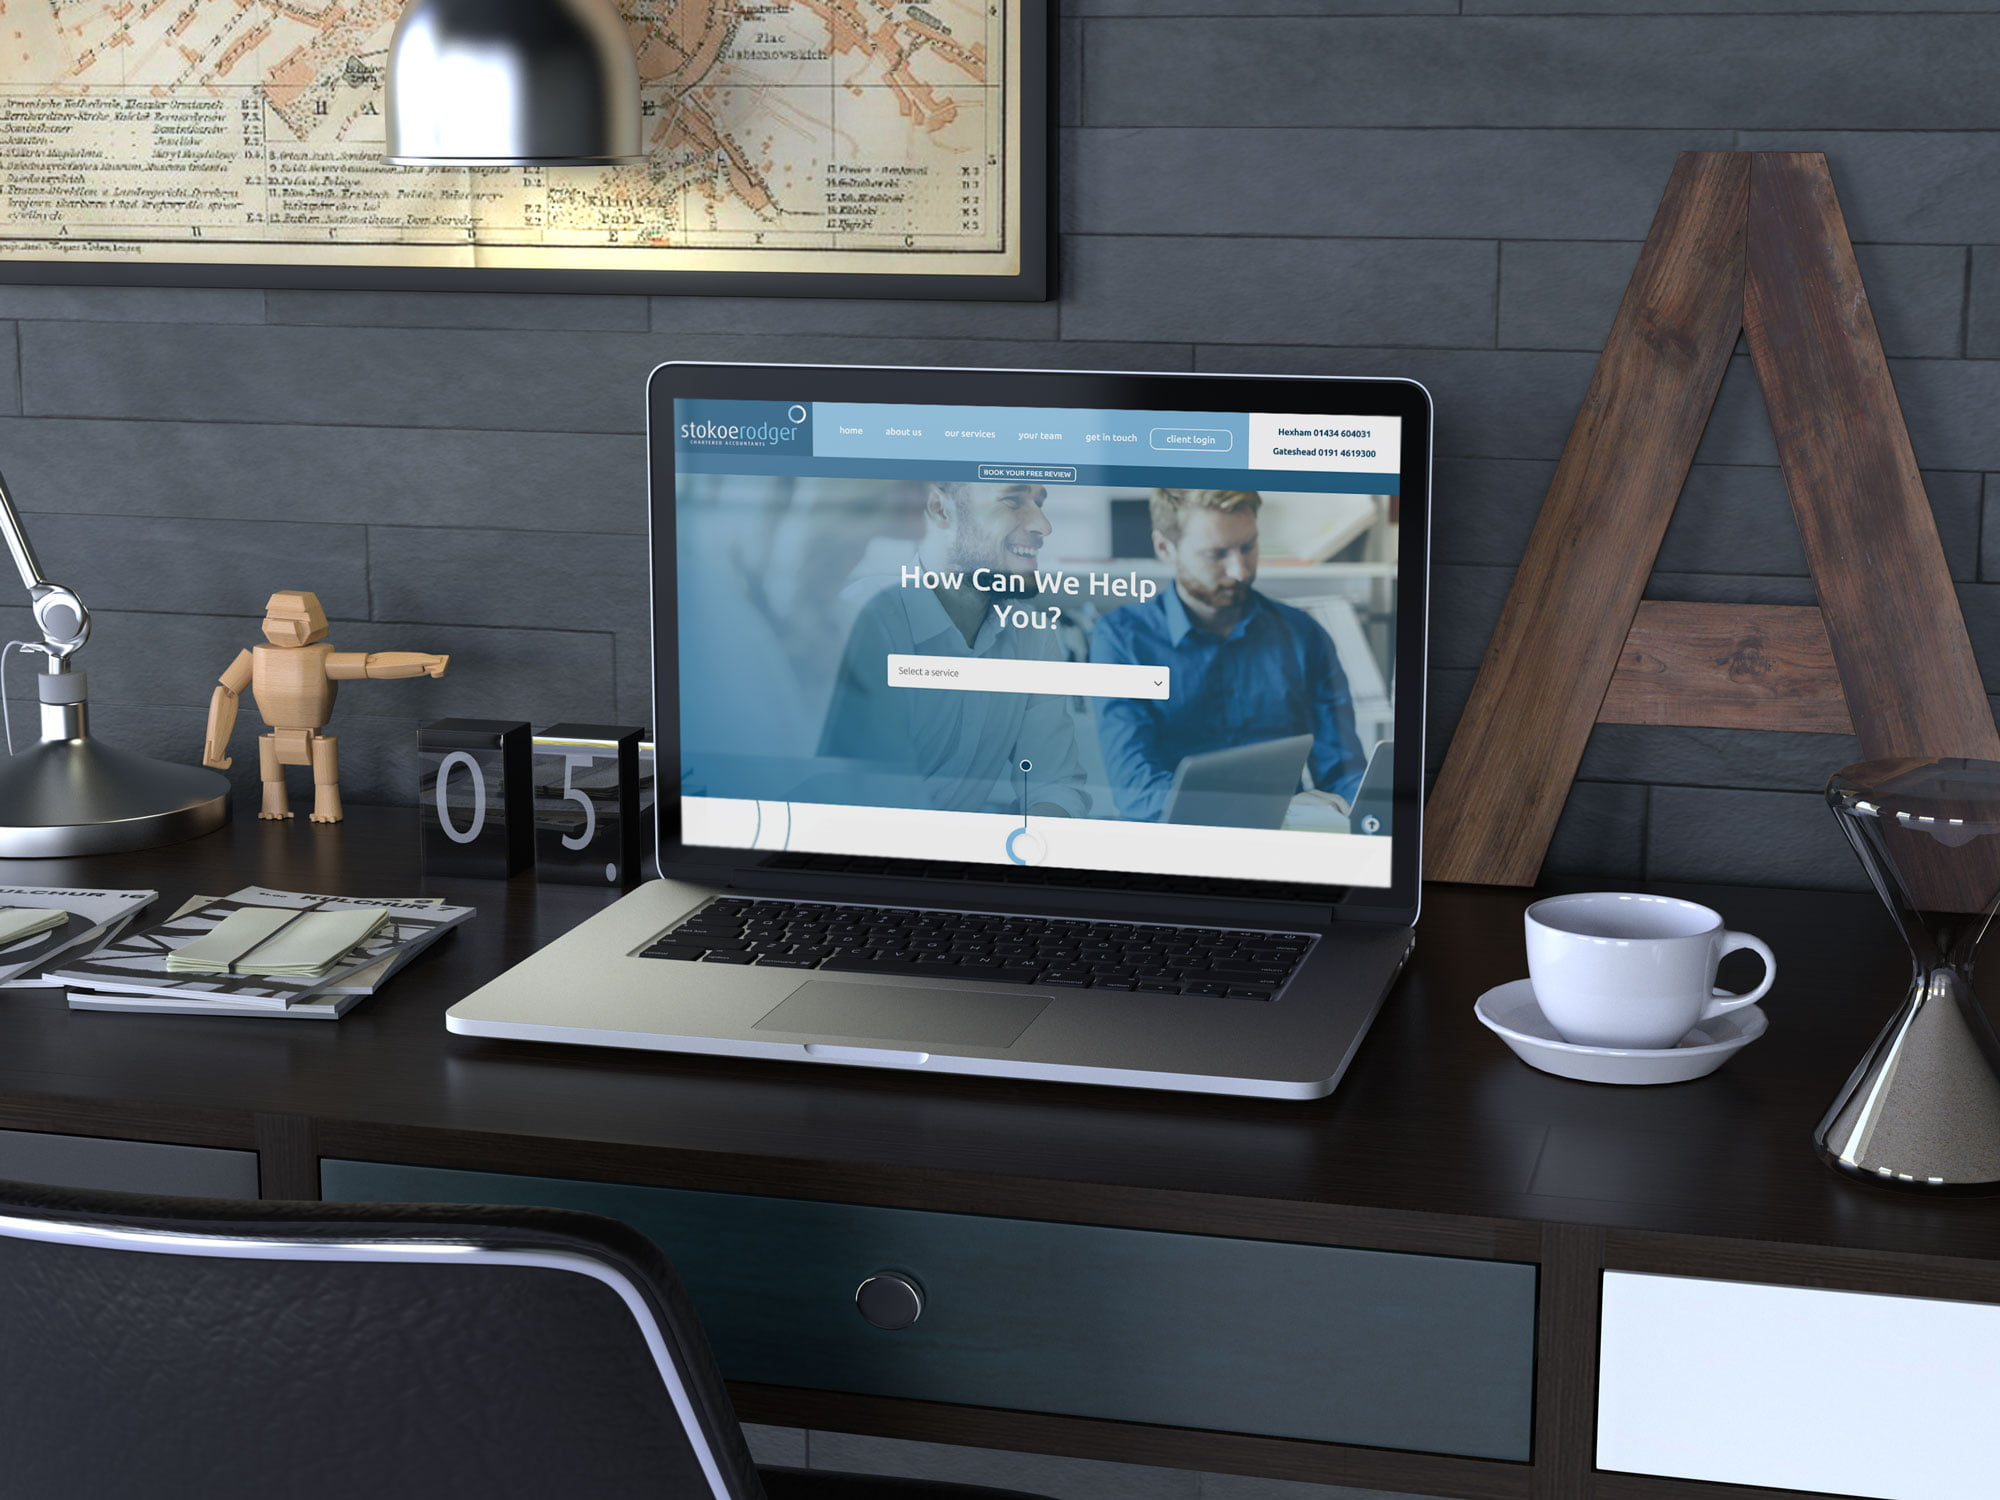 Stokoe Rodger website displayed on laptop computer